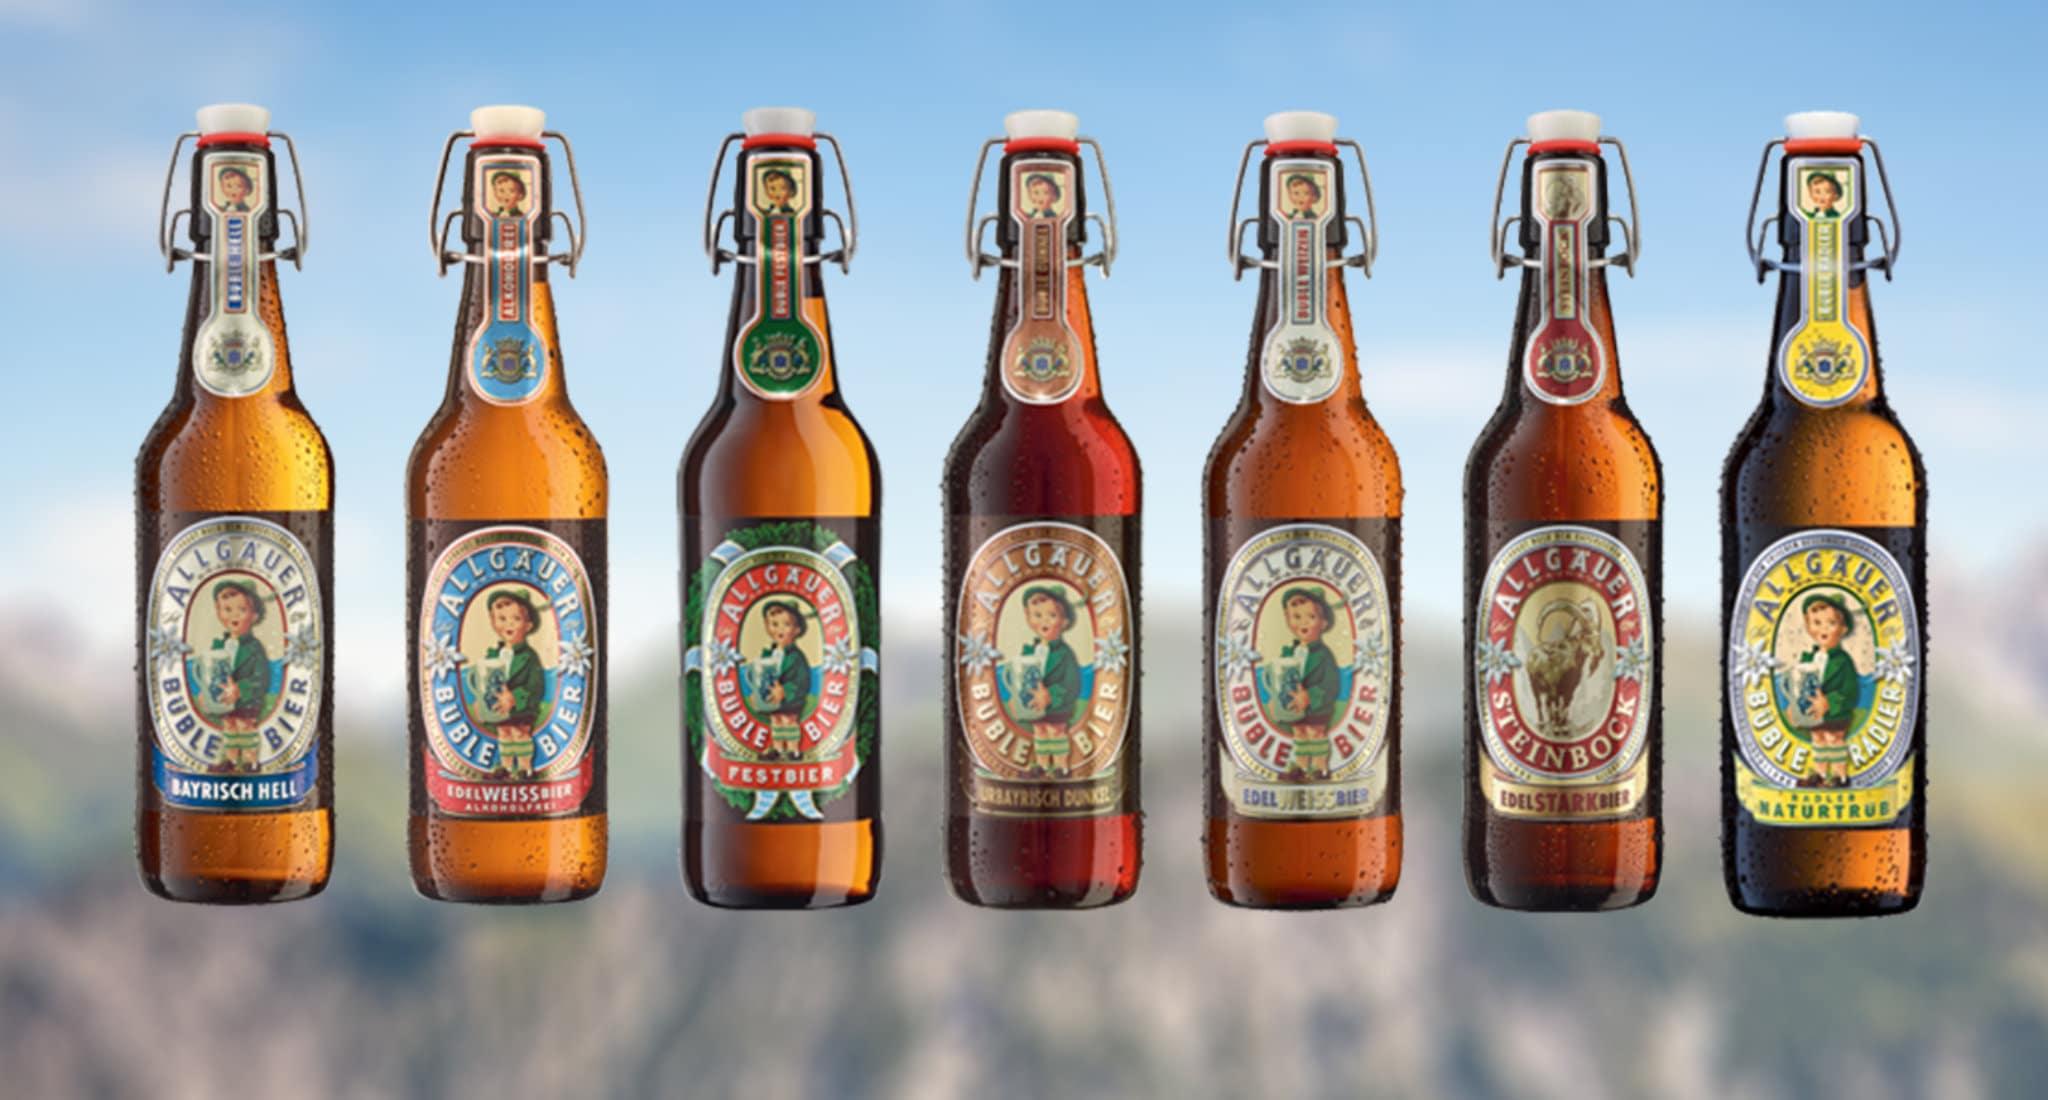 Exklusives Vollsortiment: Büble Bier aus dem Allgäu